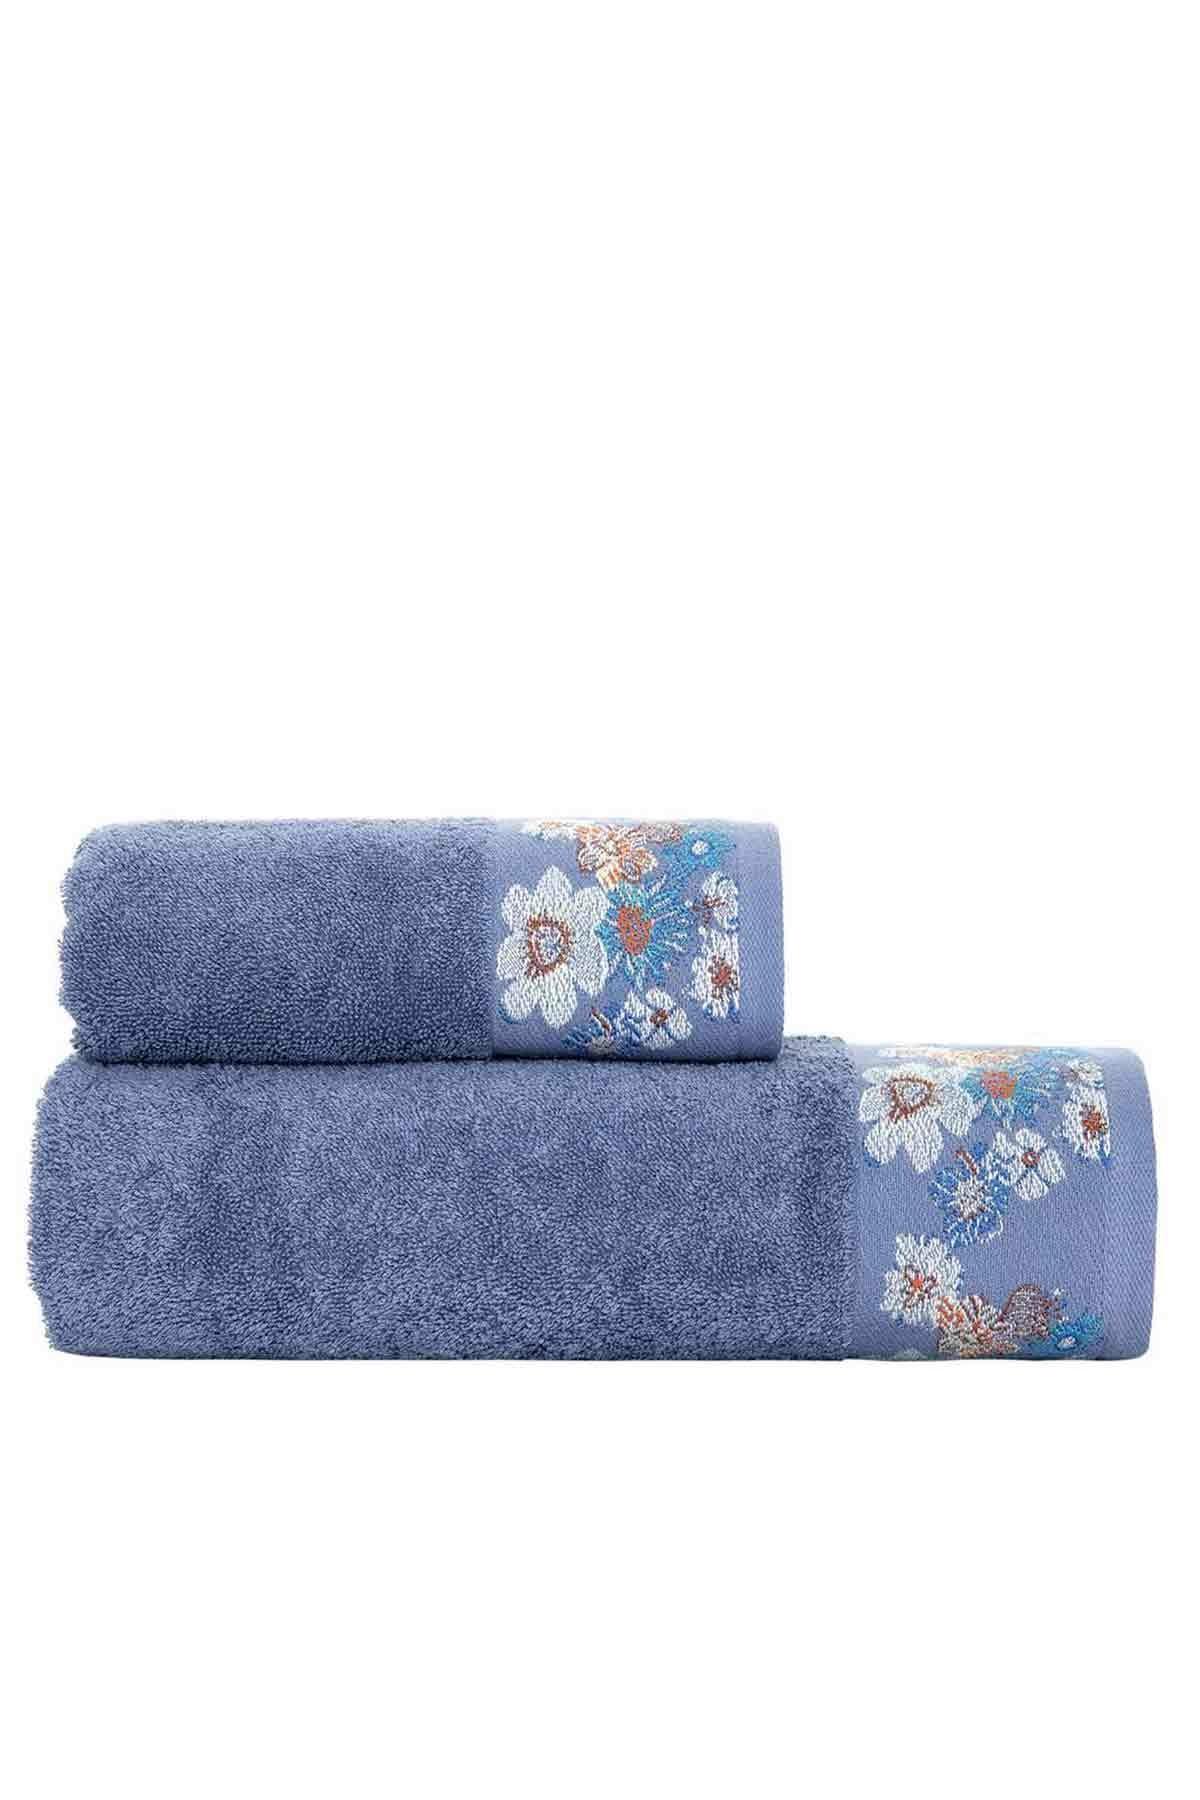 Arya Home Belissa Jakarlı Banyo Havlusu Mavi 1